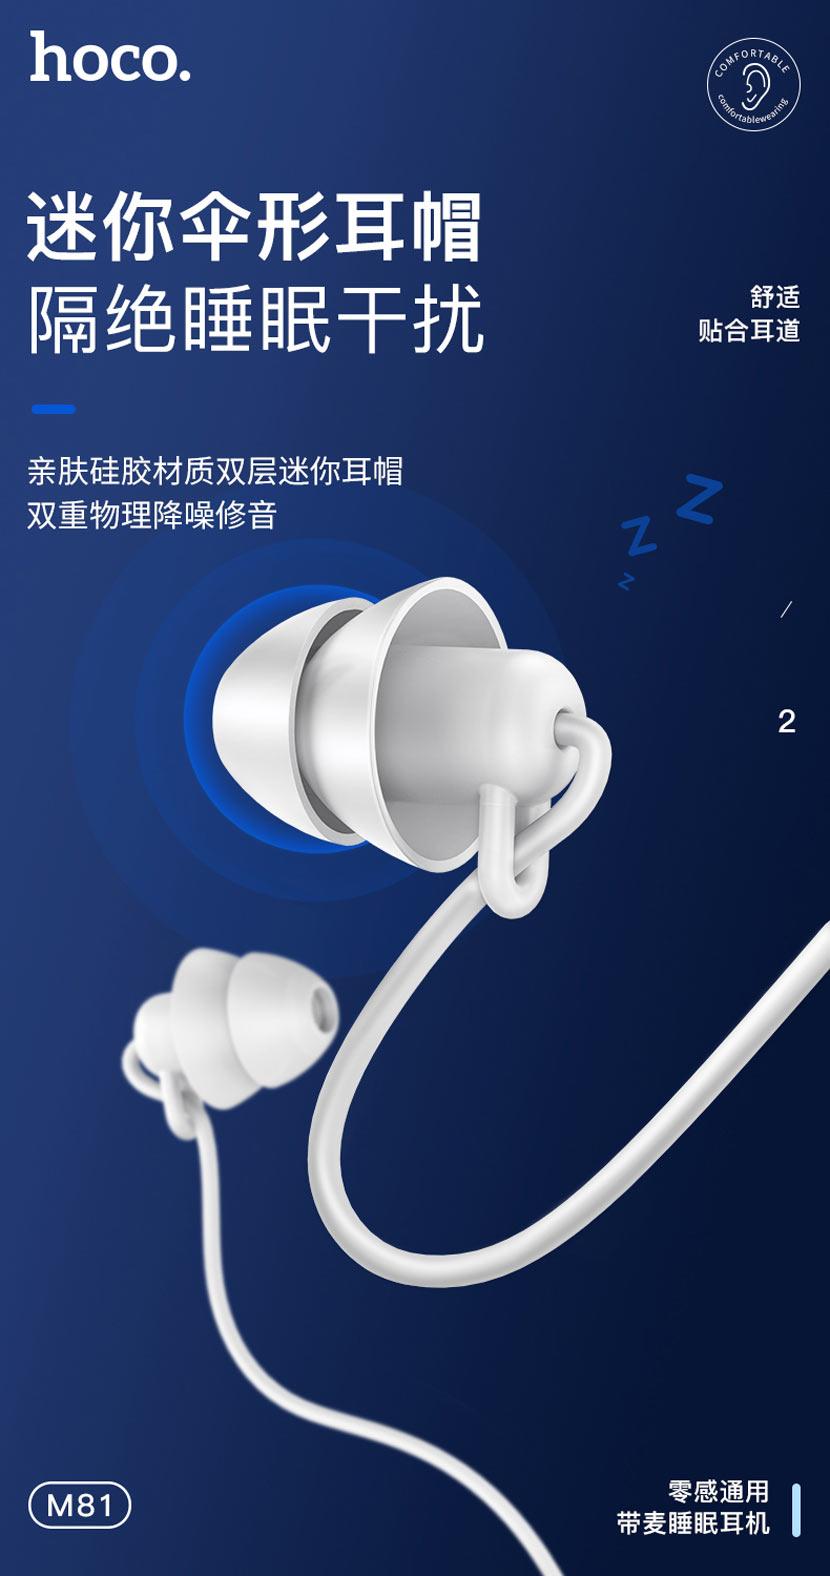 hoco news m81 imperceptible sleeping earphones with mic ear caps cn